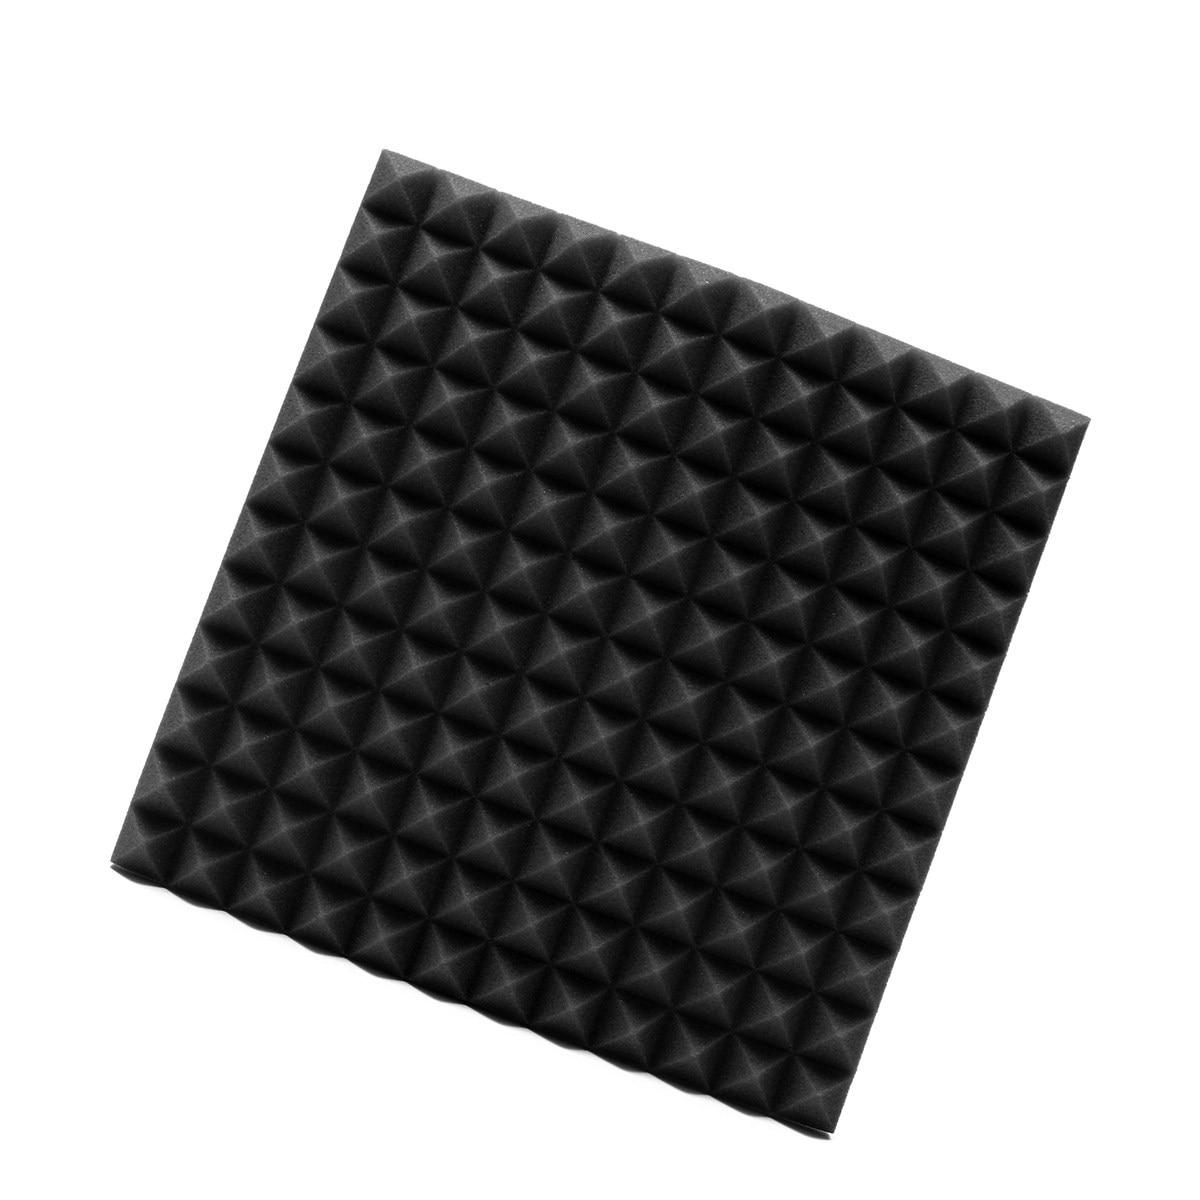 45x45x3cm Black Soundproofing Foam Acoustic Foam Sound